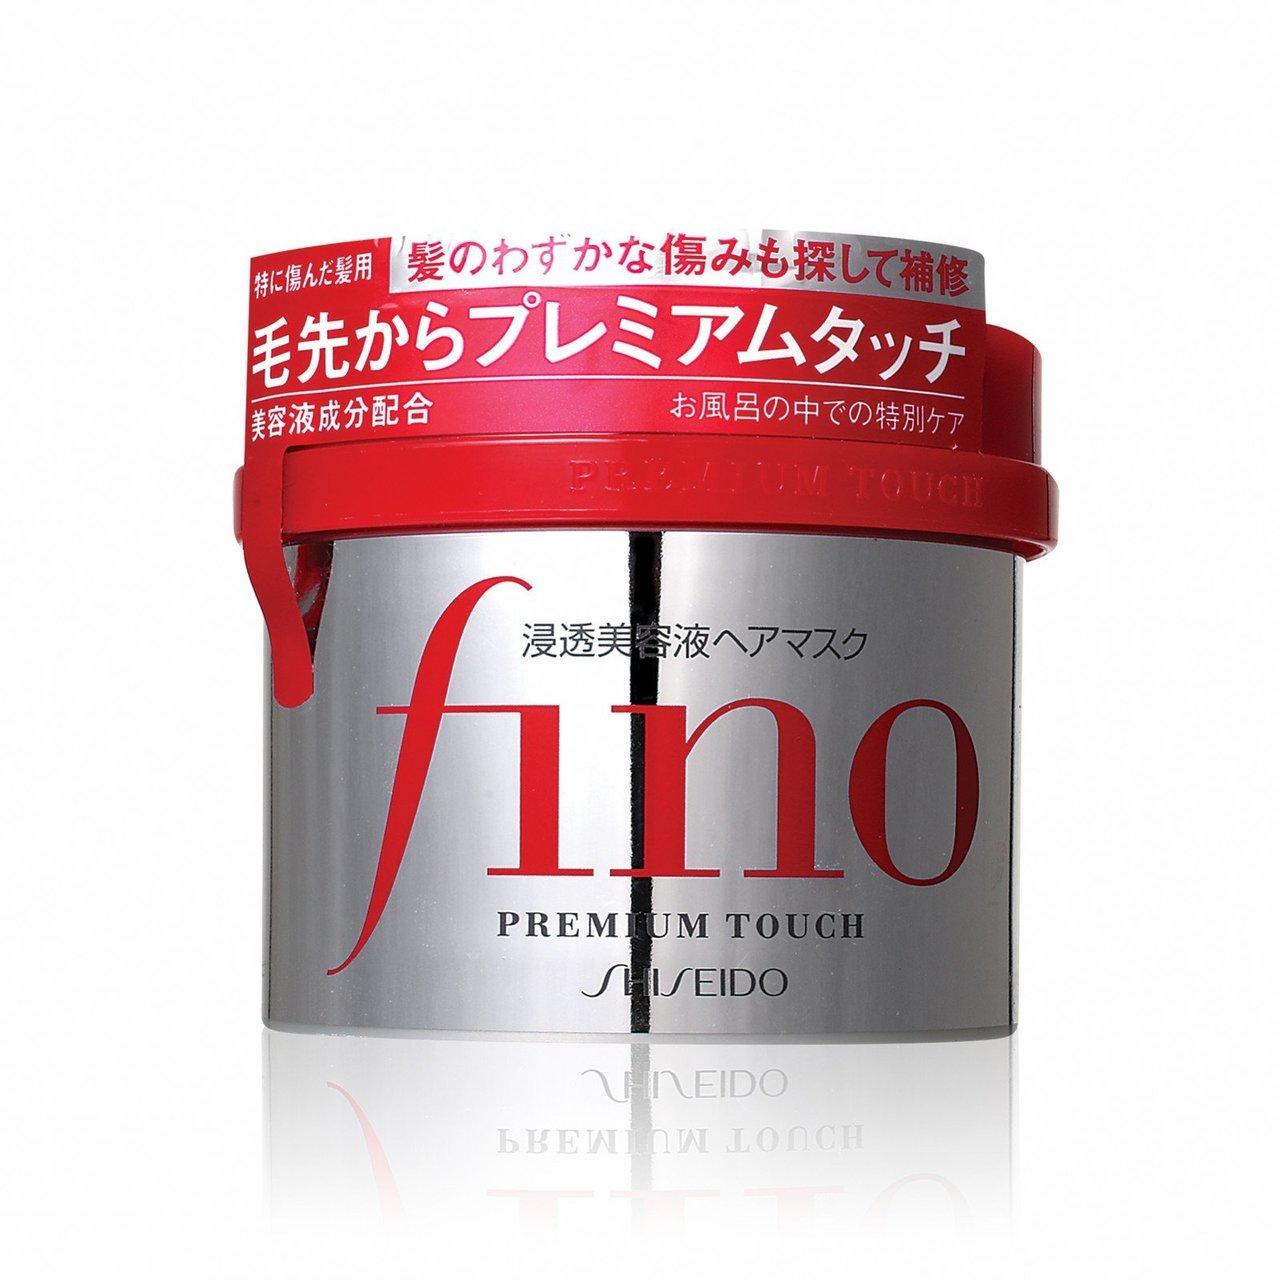 Ủ Tóc Fino Premium Touch Shiseido 230G